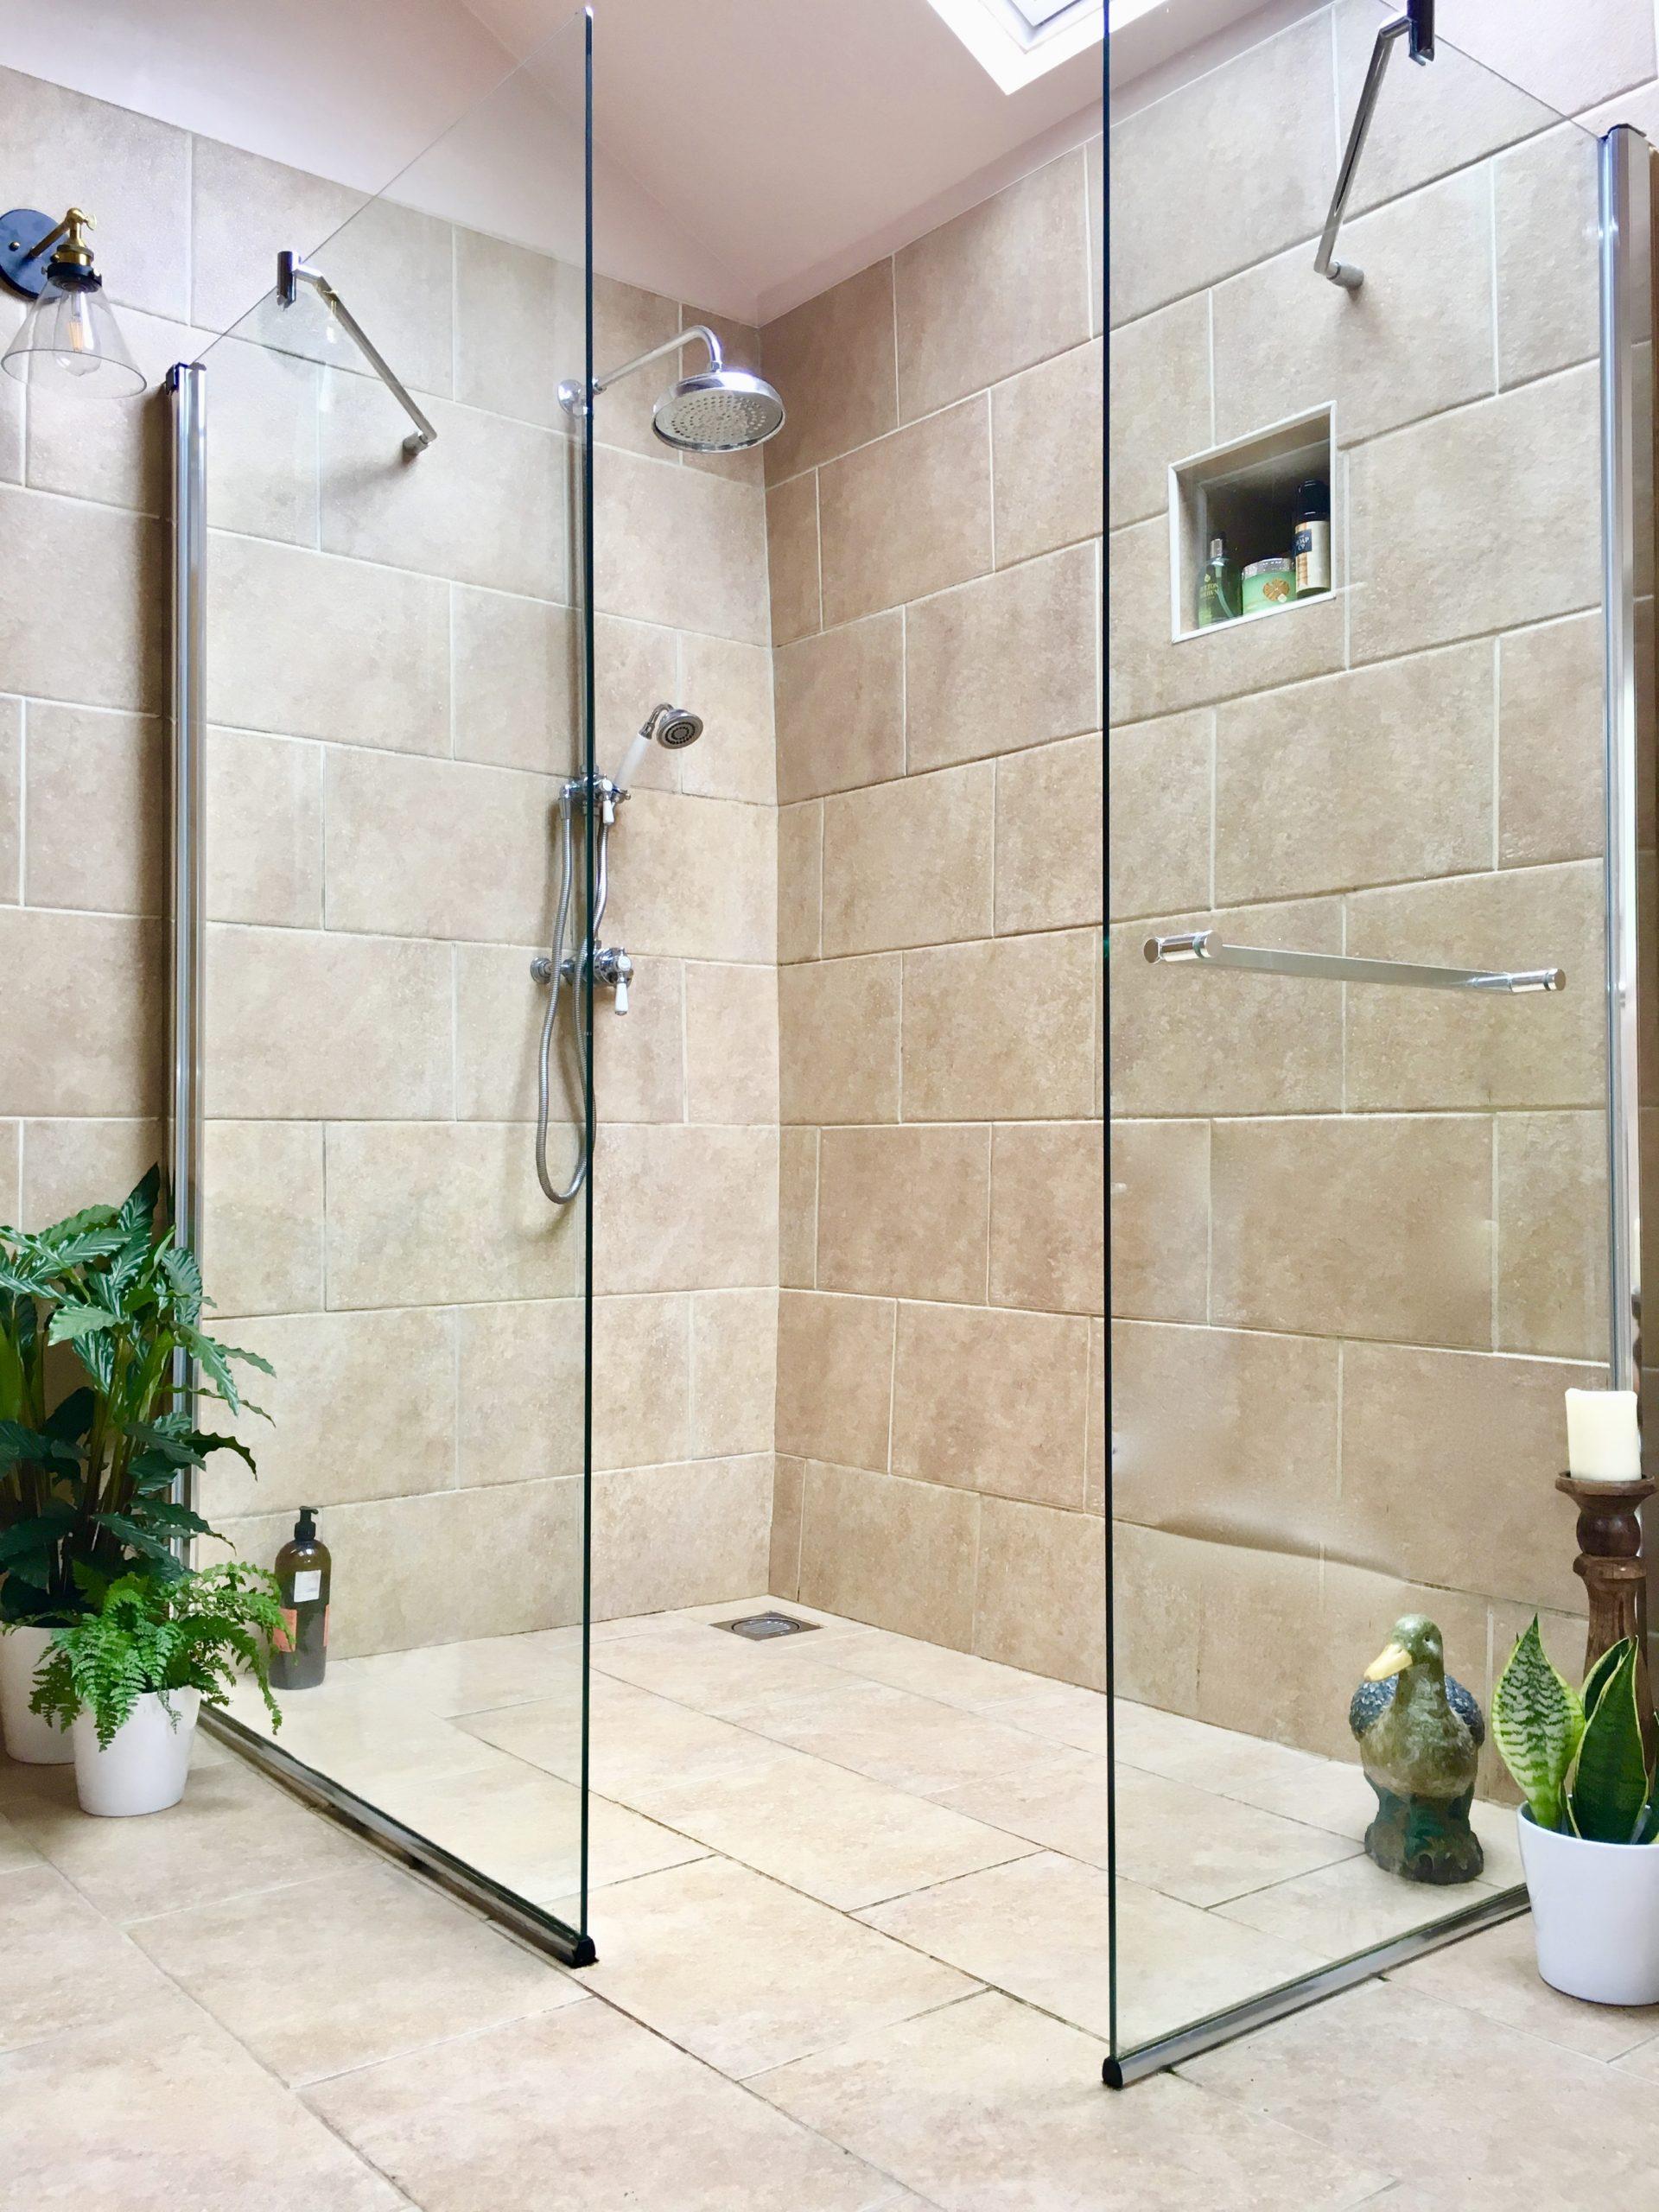 Interior Design Blog - large wet room designed by Amelia Wilson Interiors Ltd